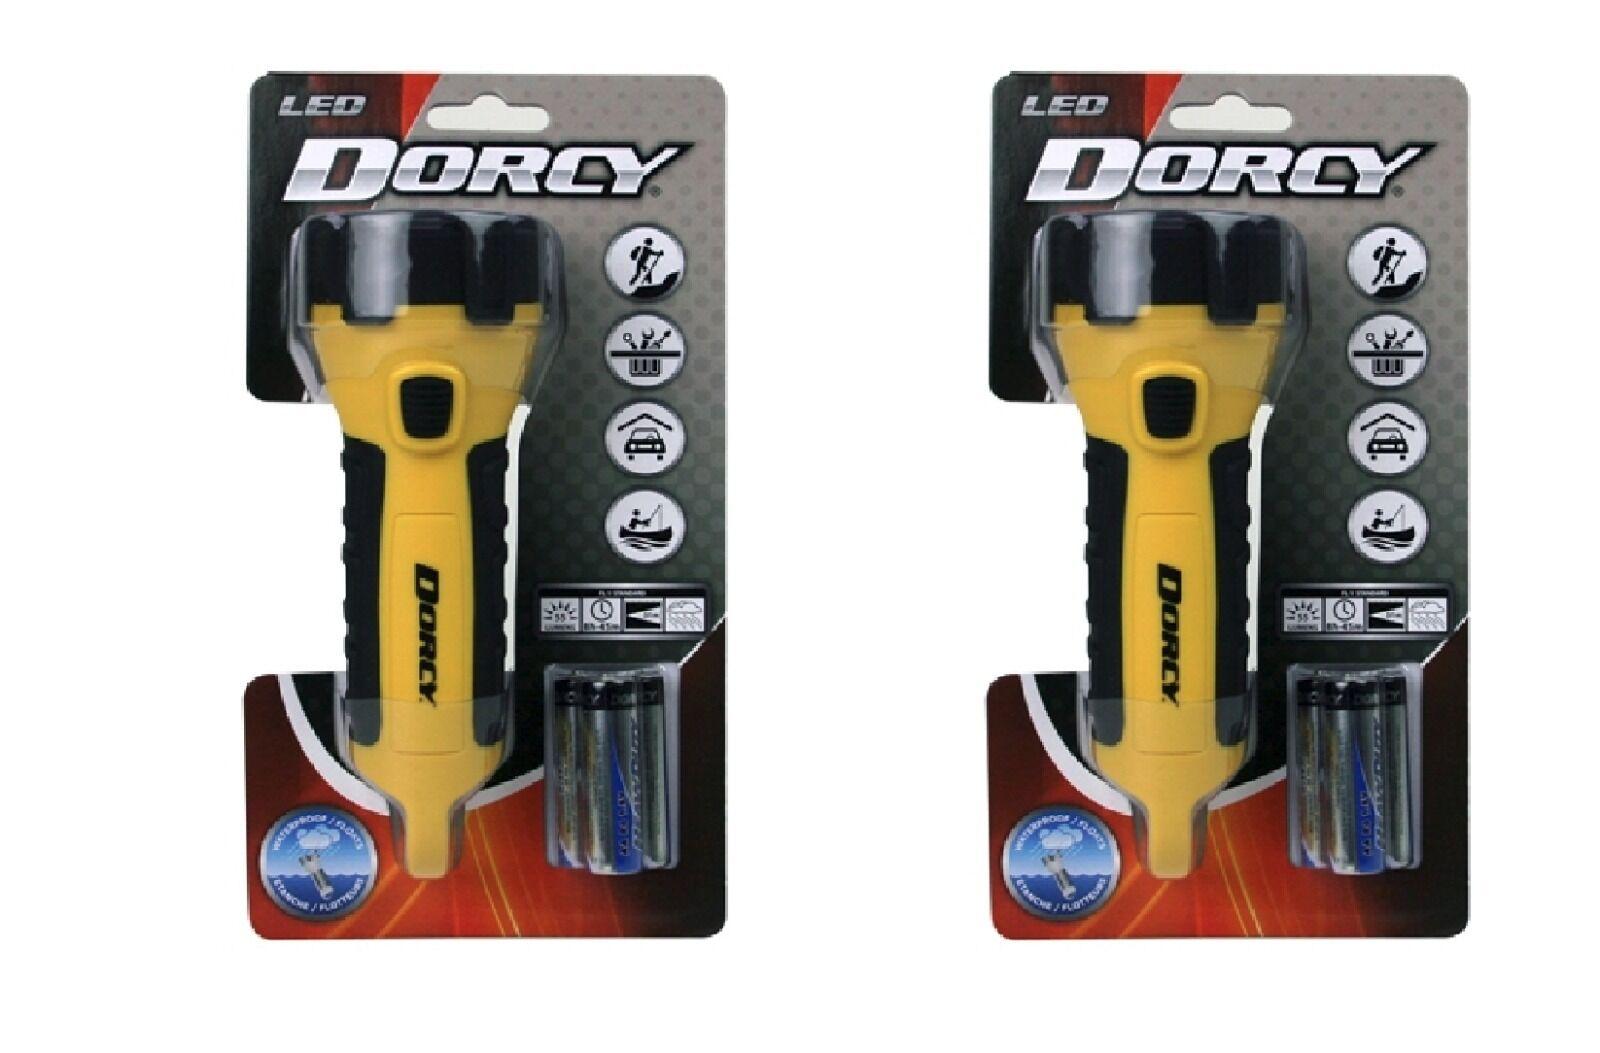 [2 Pack] Dorcy 412510  Waterproof, LED Flashlight, 55 Luuomini, gituttio.